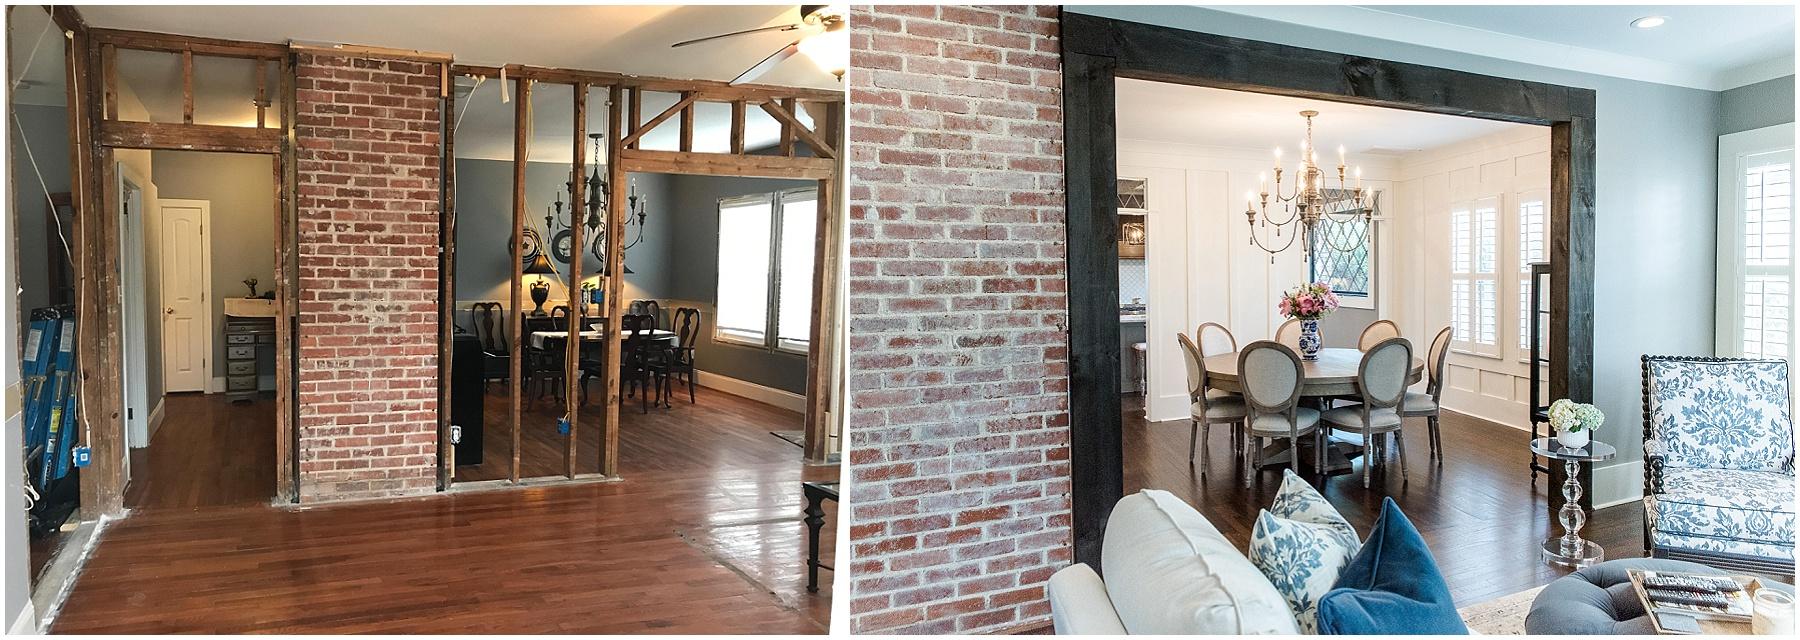 College Avenue Renovation Project Copper Dwelling Design